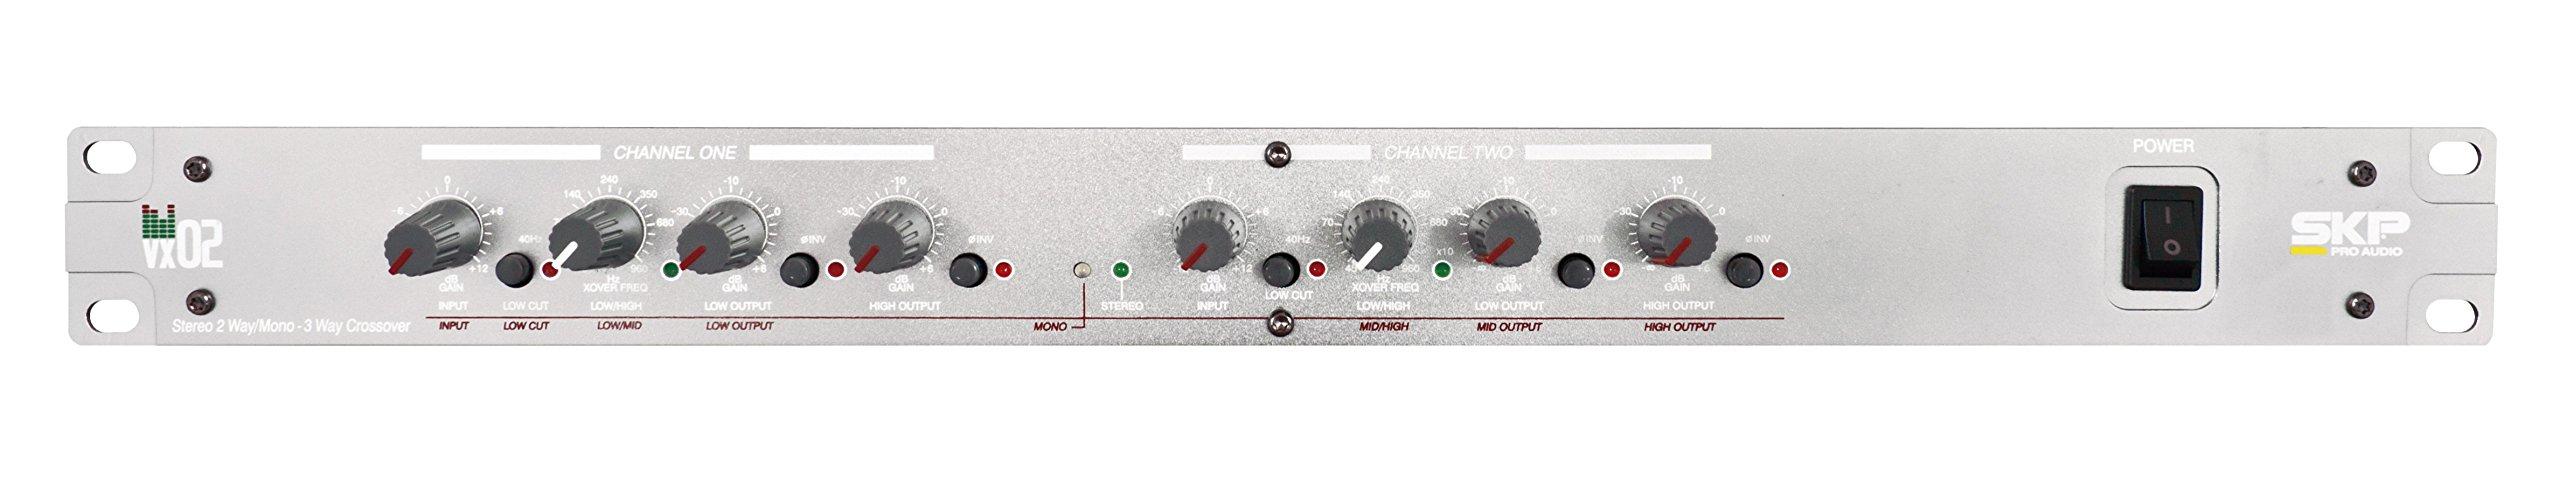 SKP PRO AUDIO Professioanl Stereo Crossover Compressor (VX-02) by SKP Pro Audio